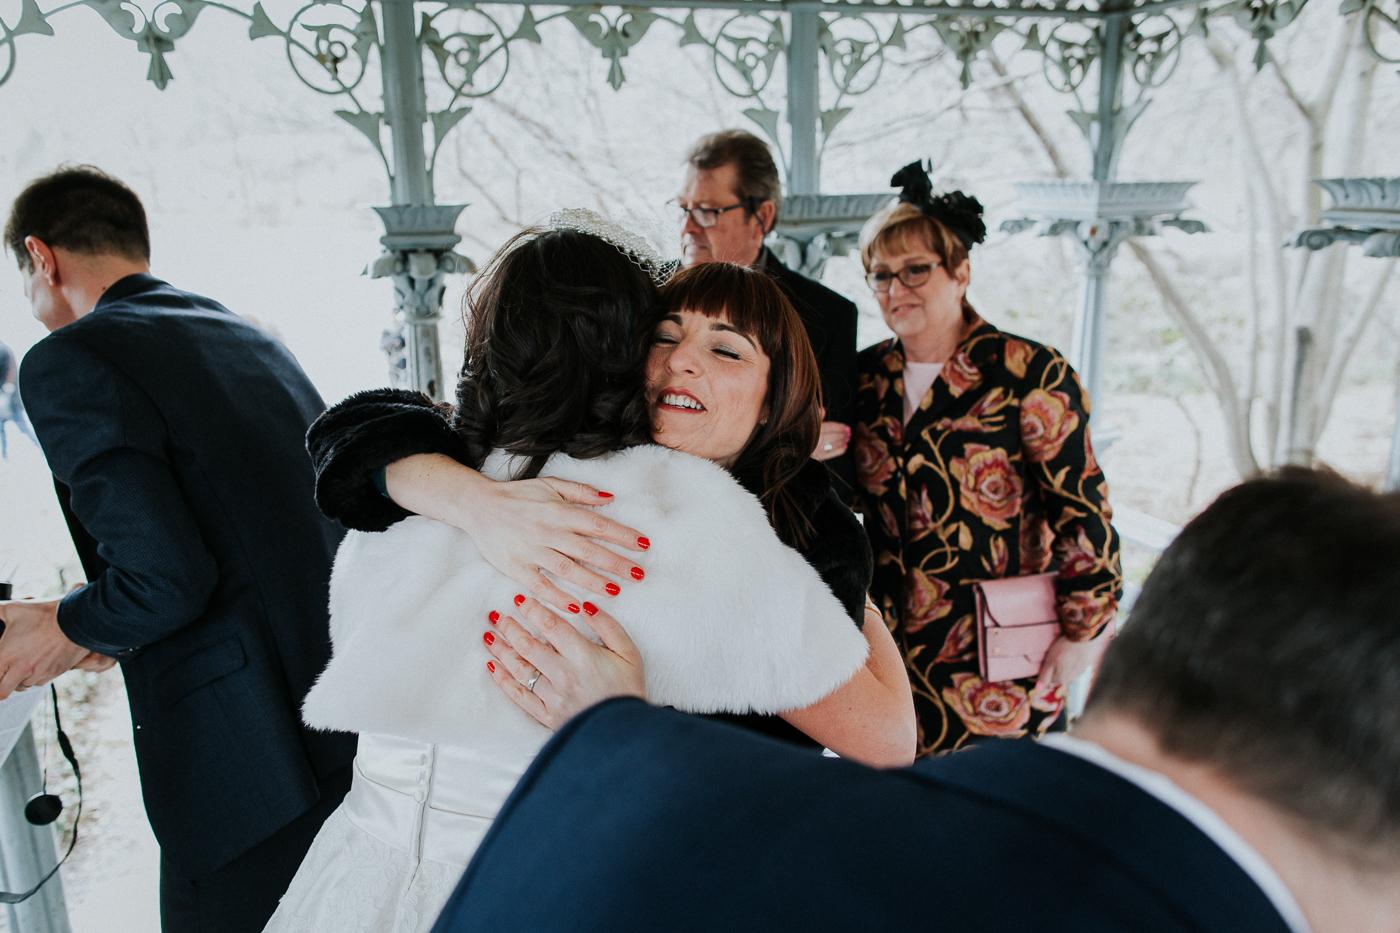 Ladies-Pavilion-Central-Park-NYC-Documentary-Elopement-Wedding-Photographer-36.jpg